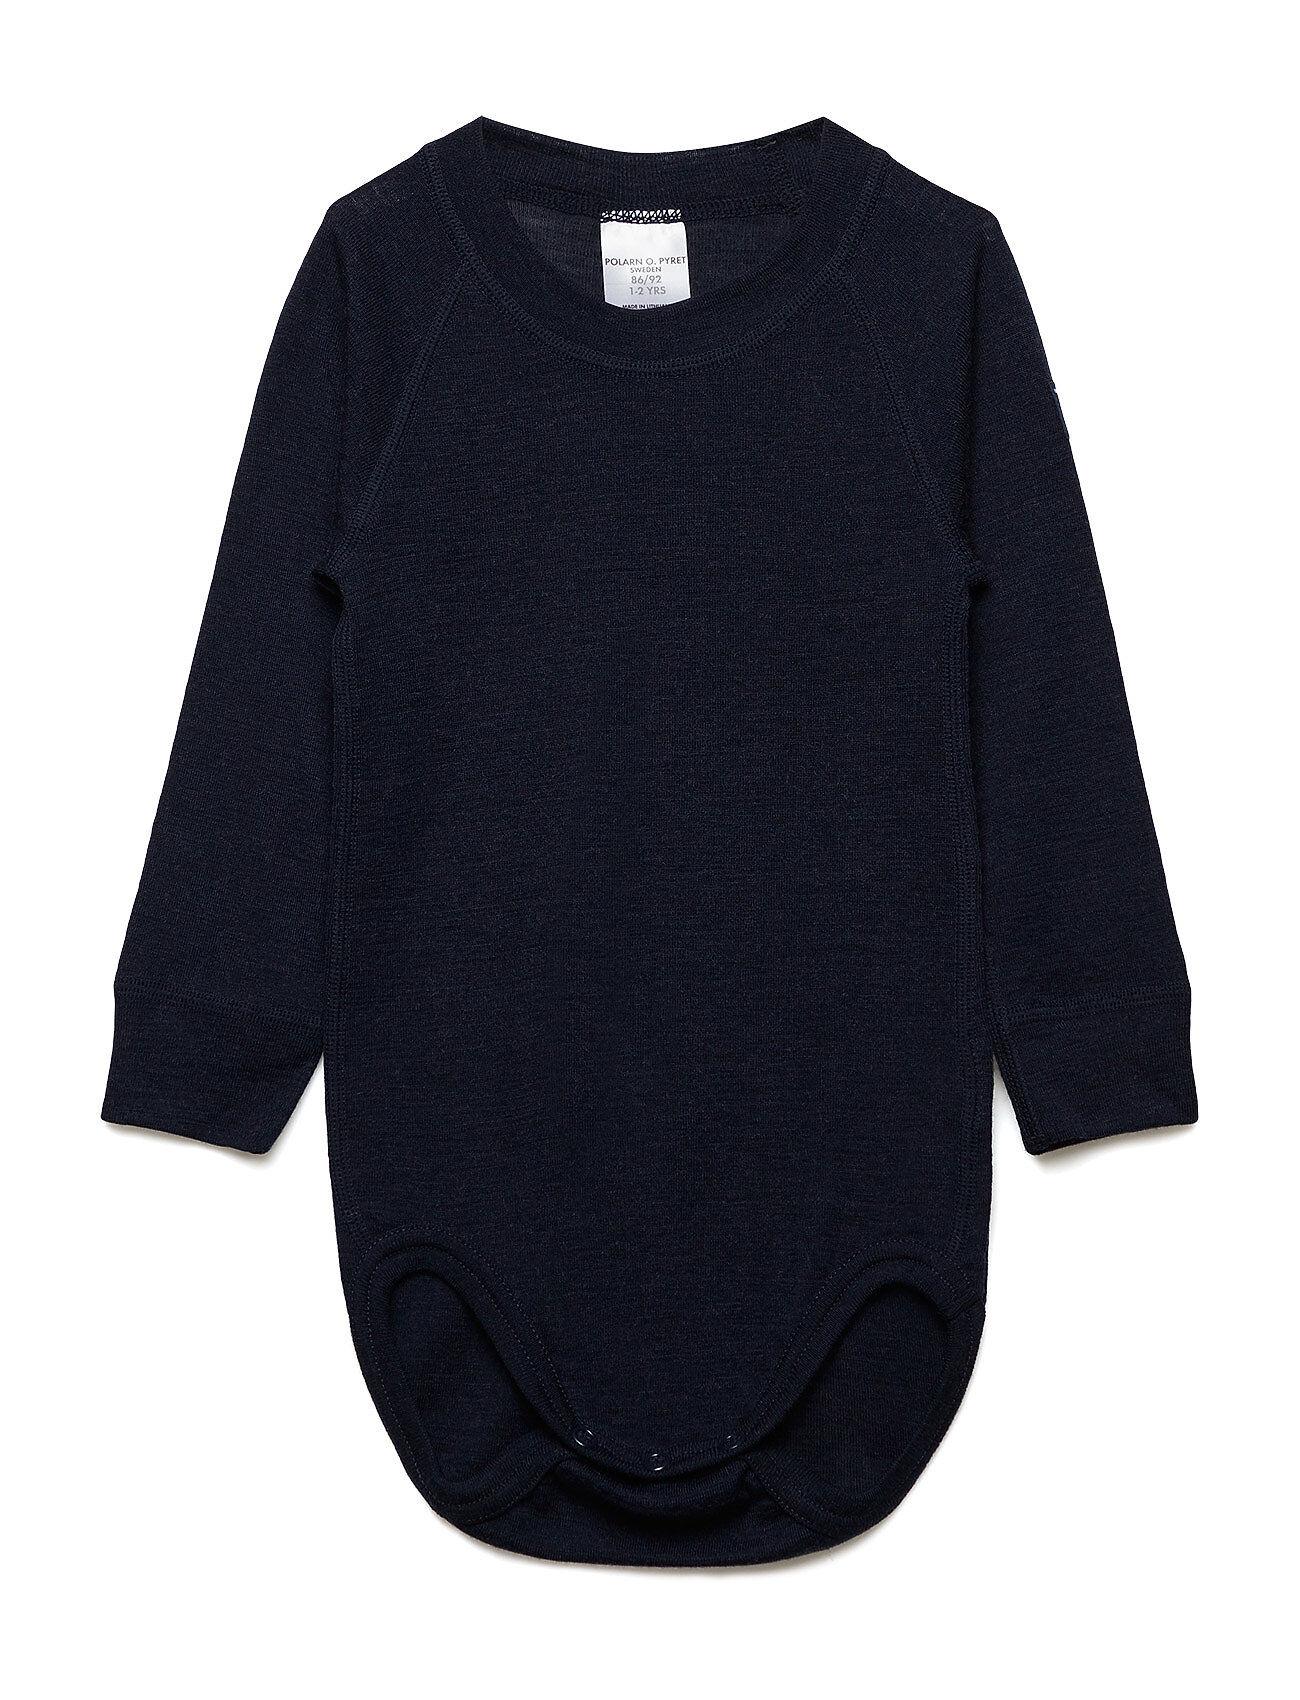 Polarn O. Pyret Body Wool Solid Baby